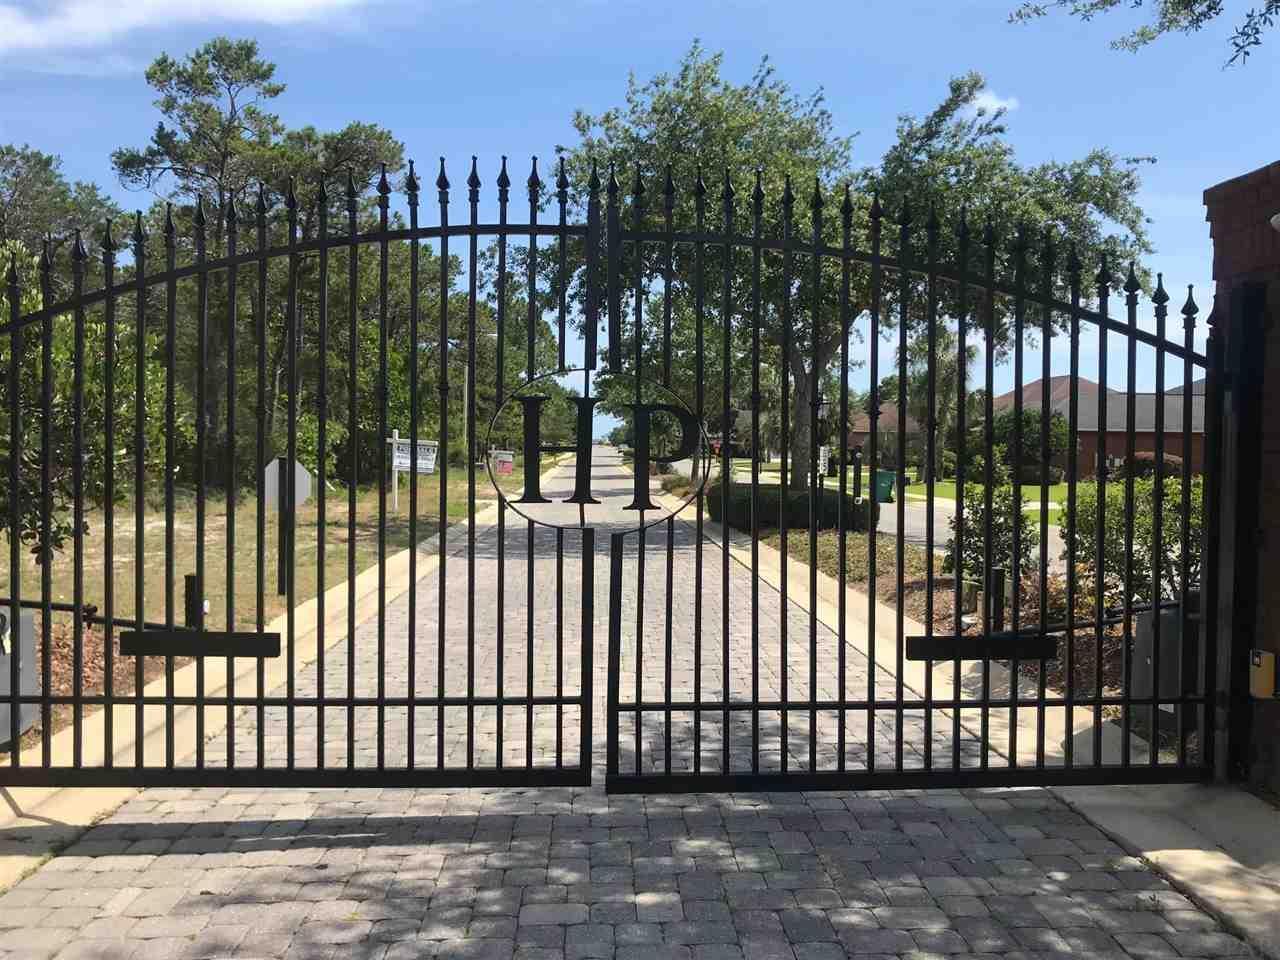 2072 Heritage Park Way, Navarre, FL 32566